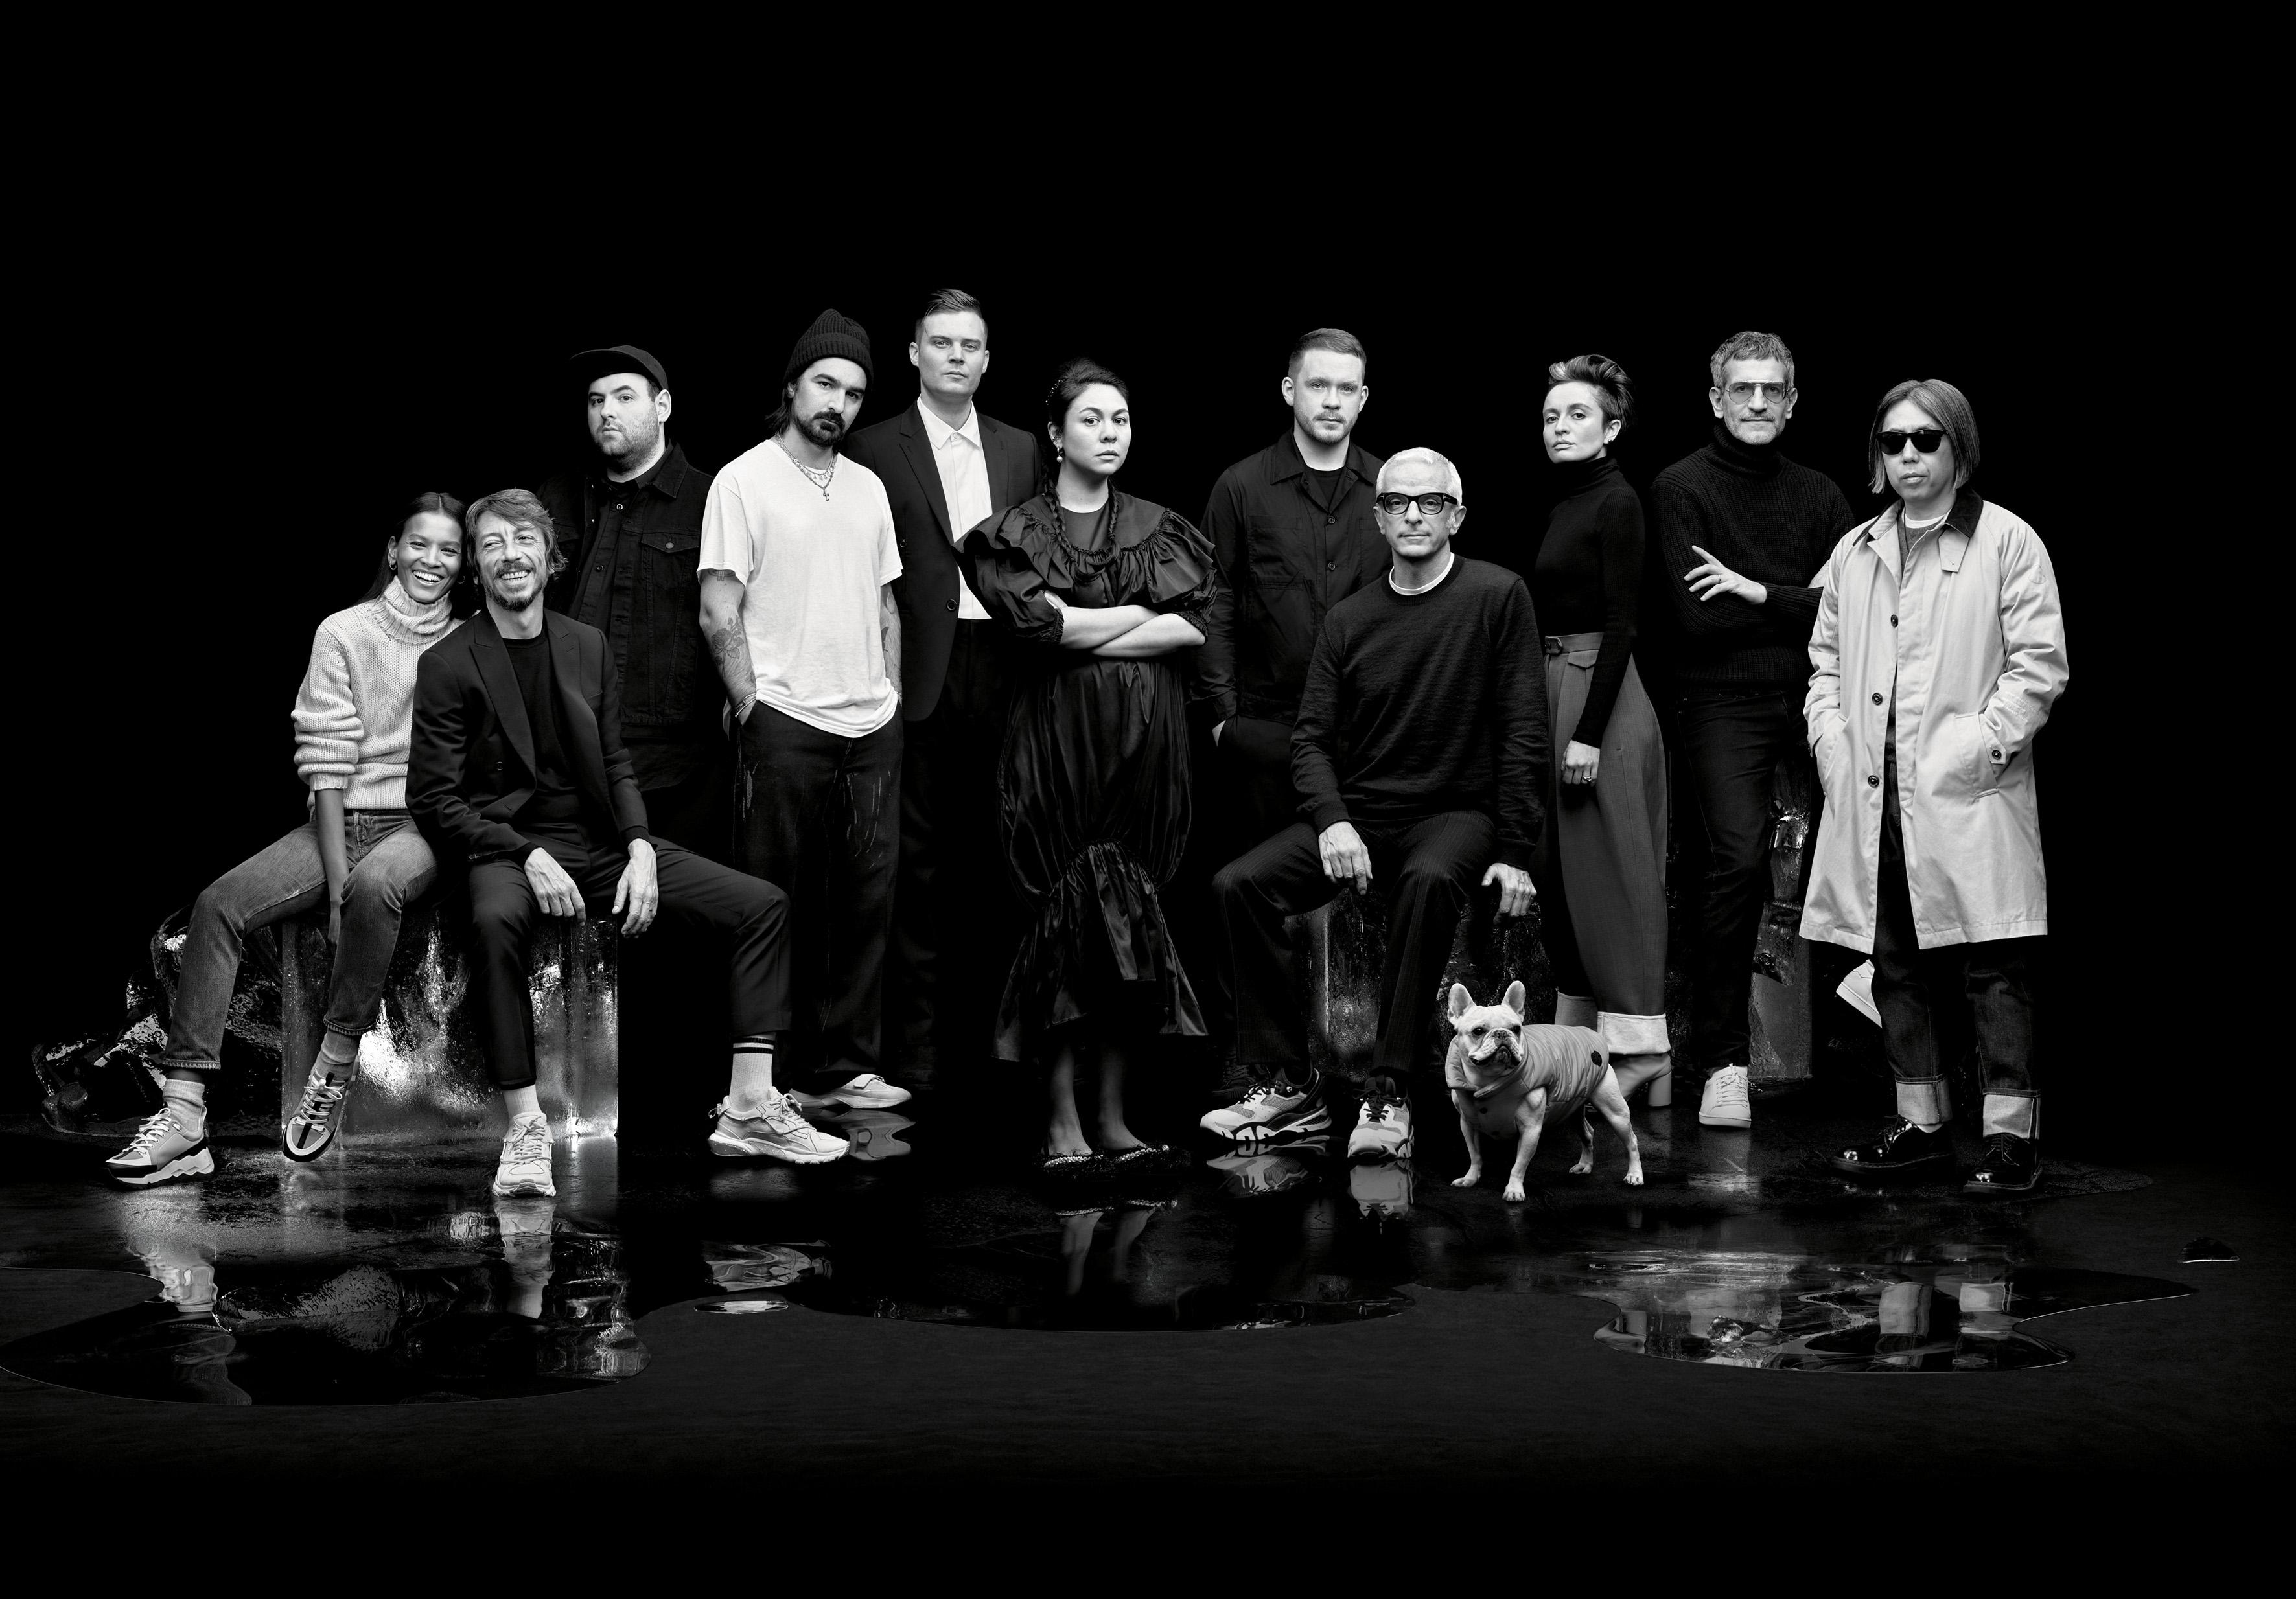 Moncler Announces Designers for Fall 2019 Moncler Genius Collection